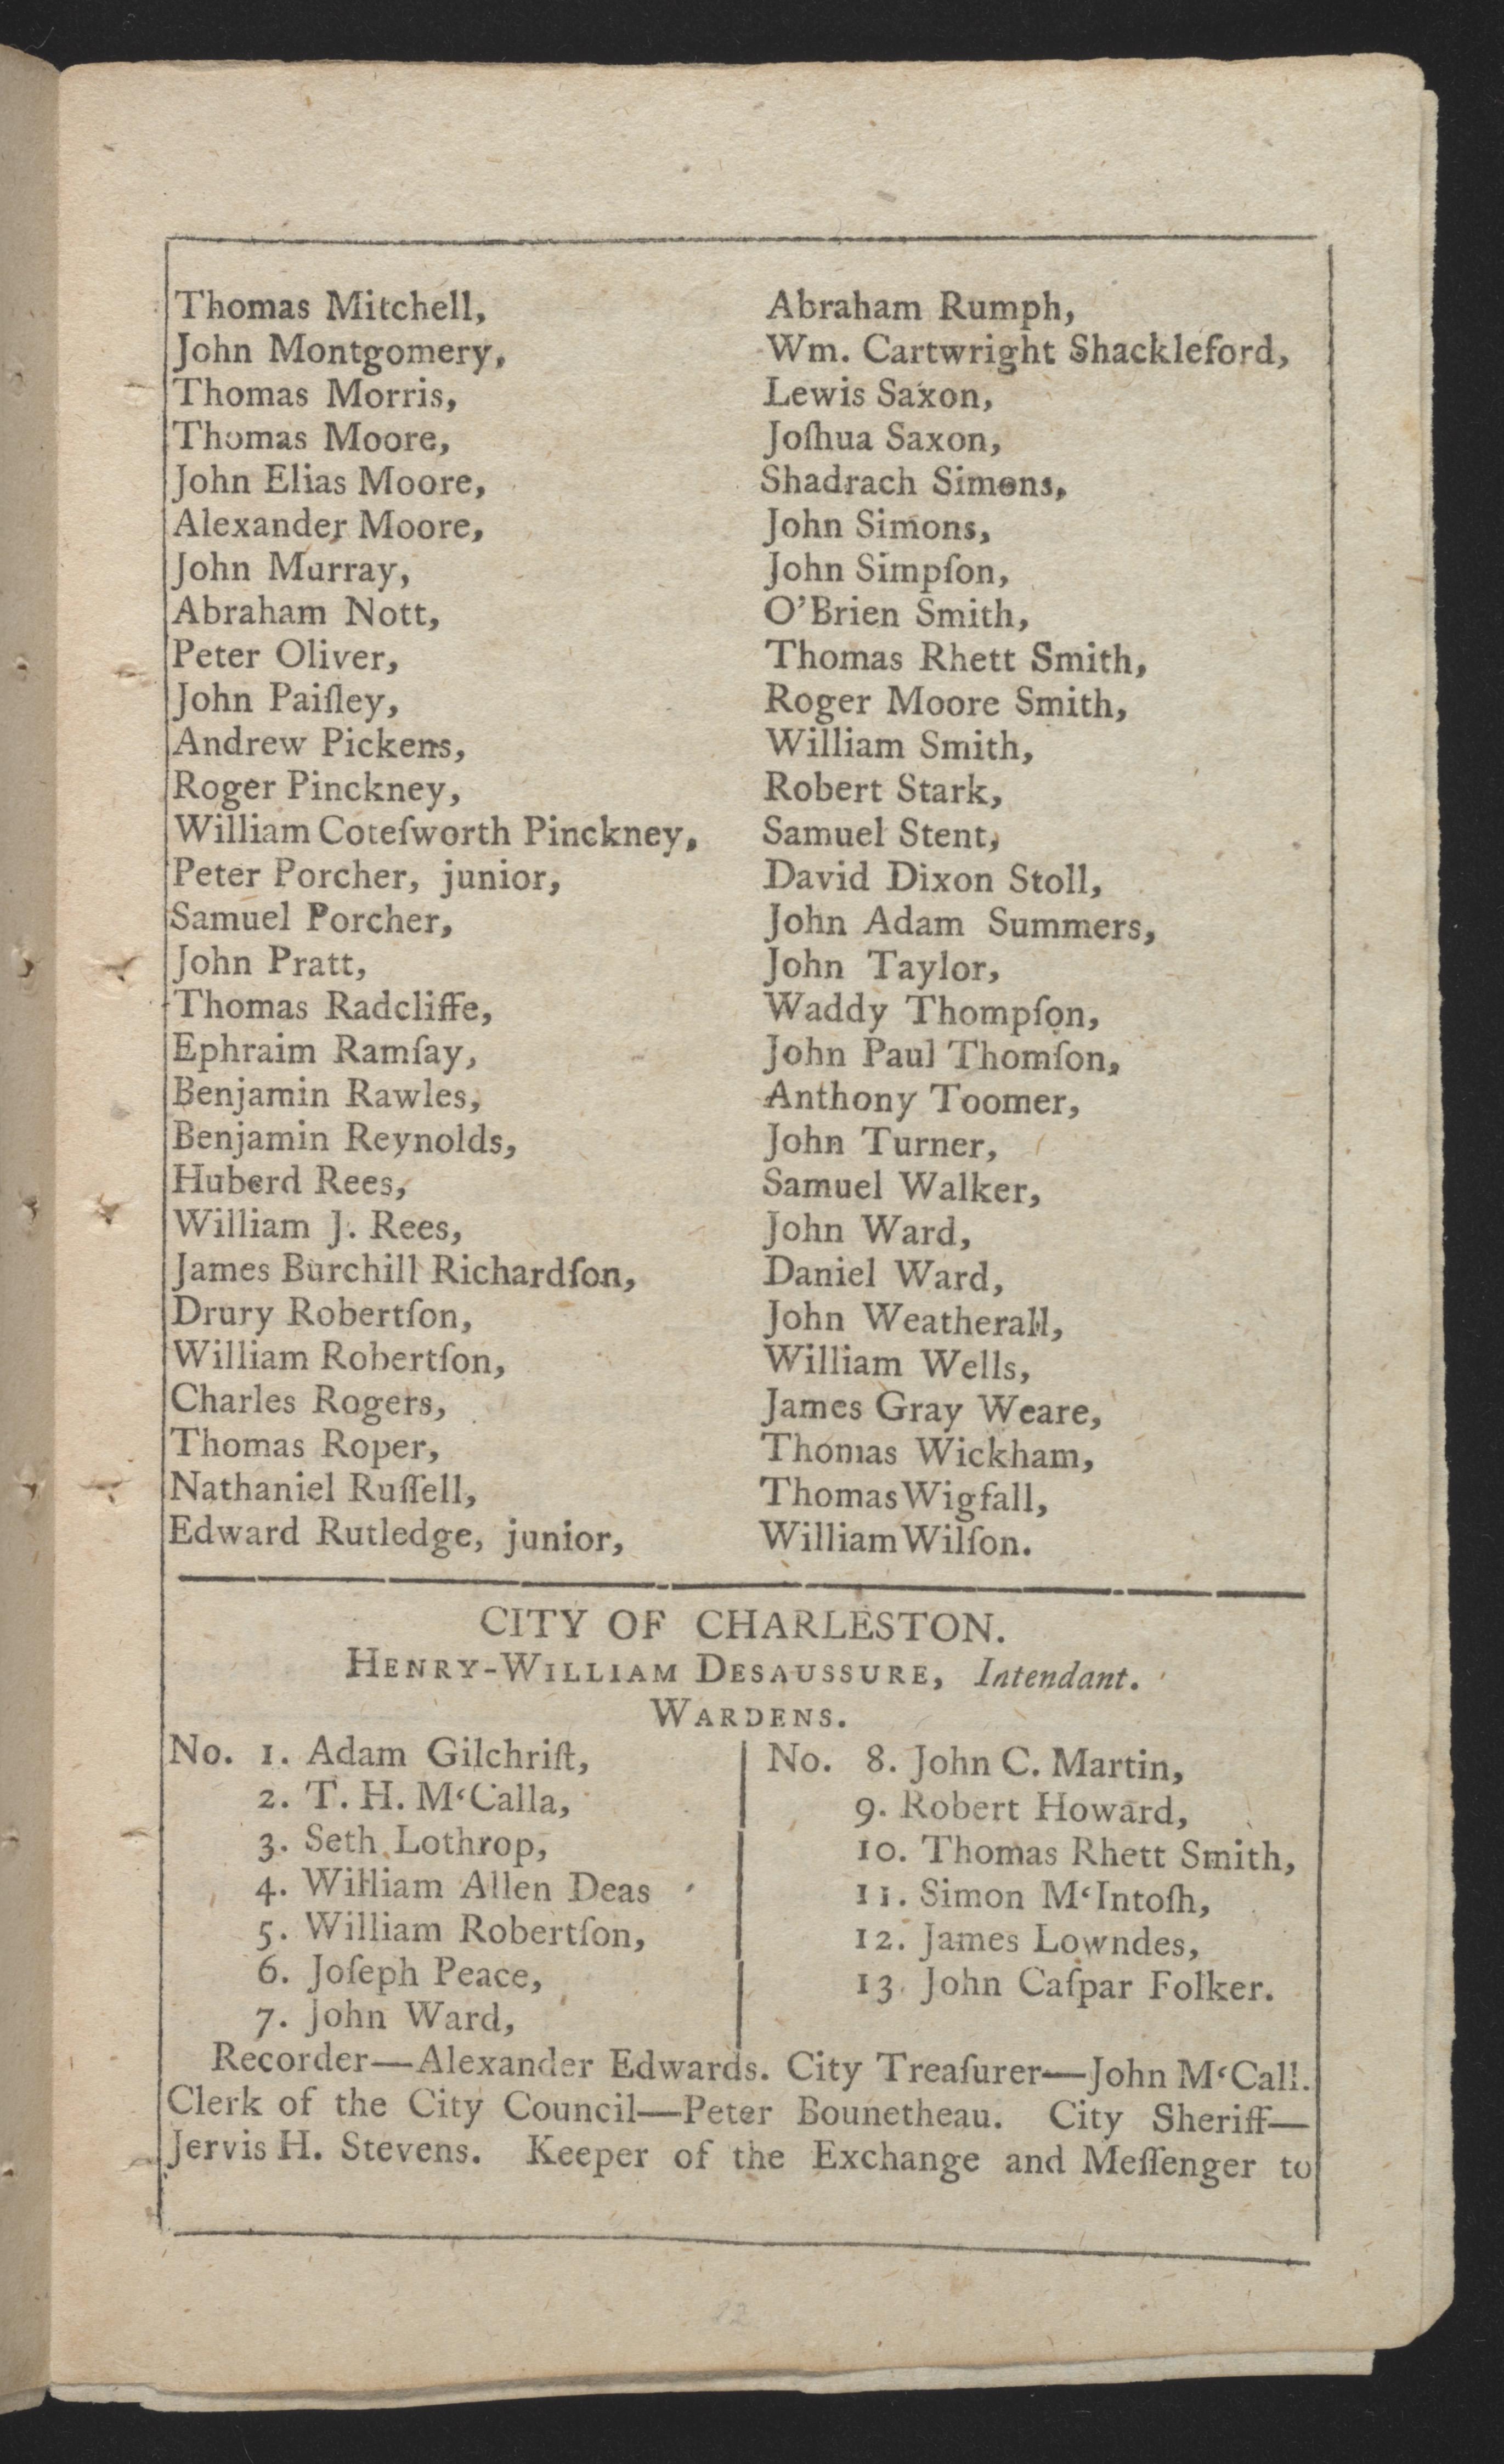 Sandy Island Plantation Journal, Volume 3, 1798, Page 44